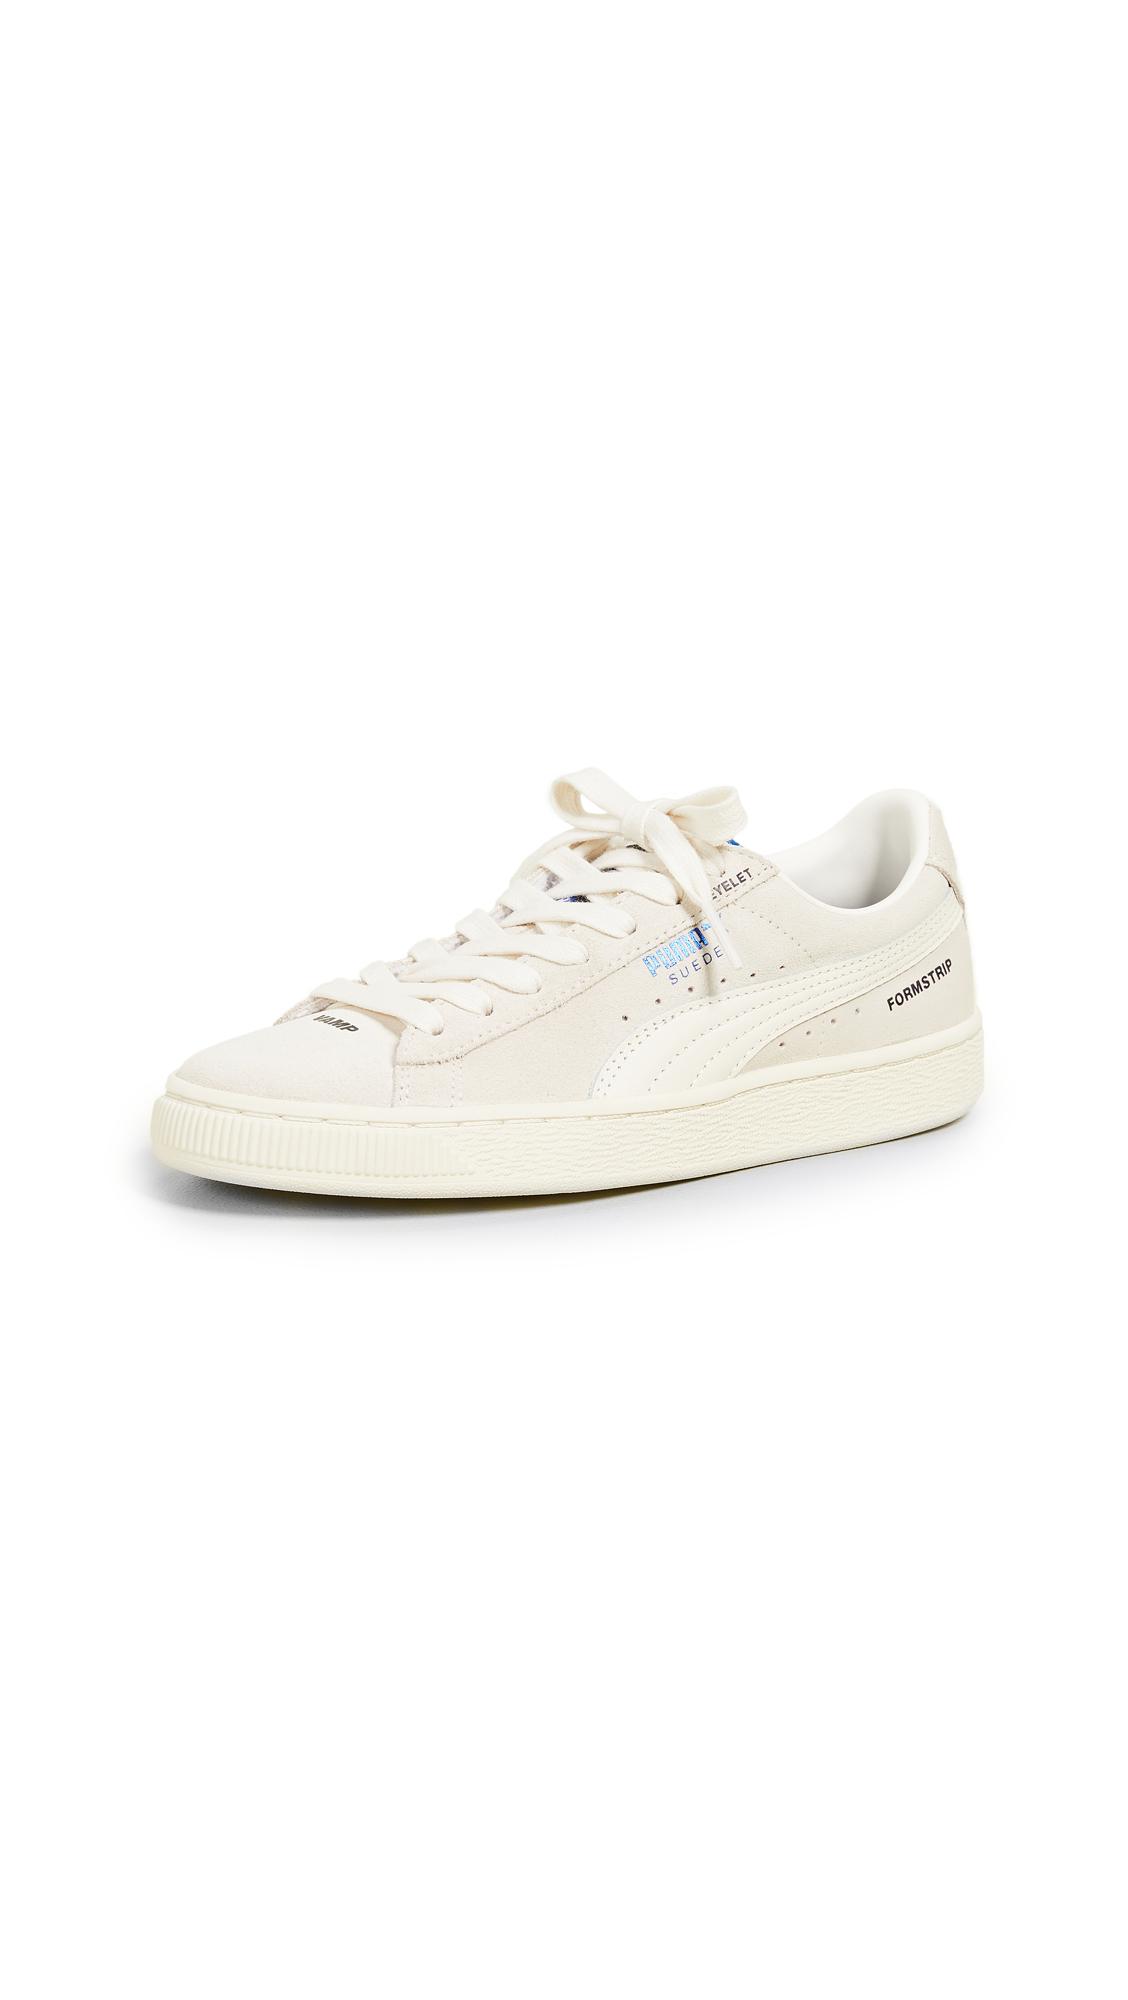 PUMA x Ader Error Sneakers - Whisper White